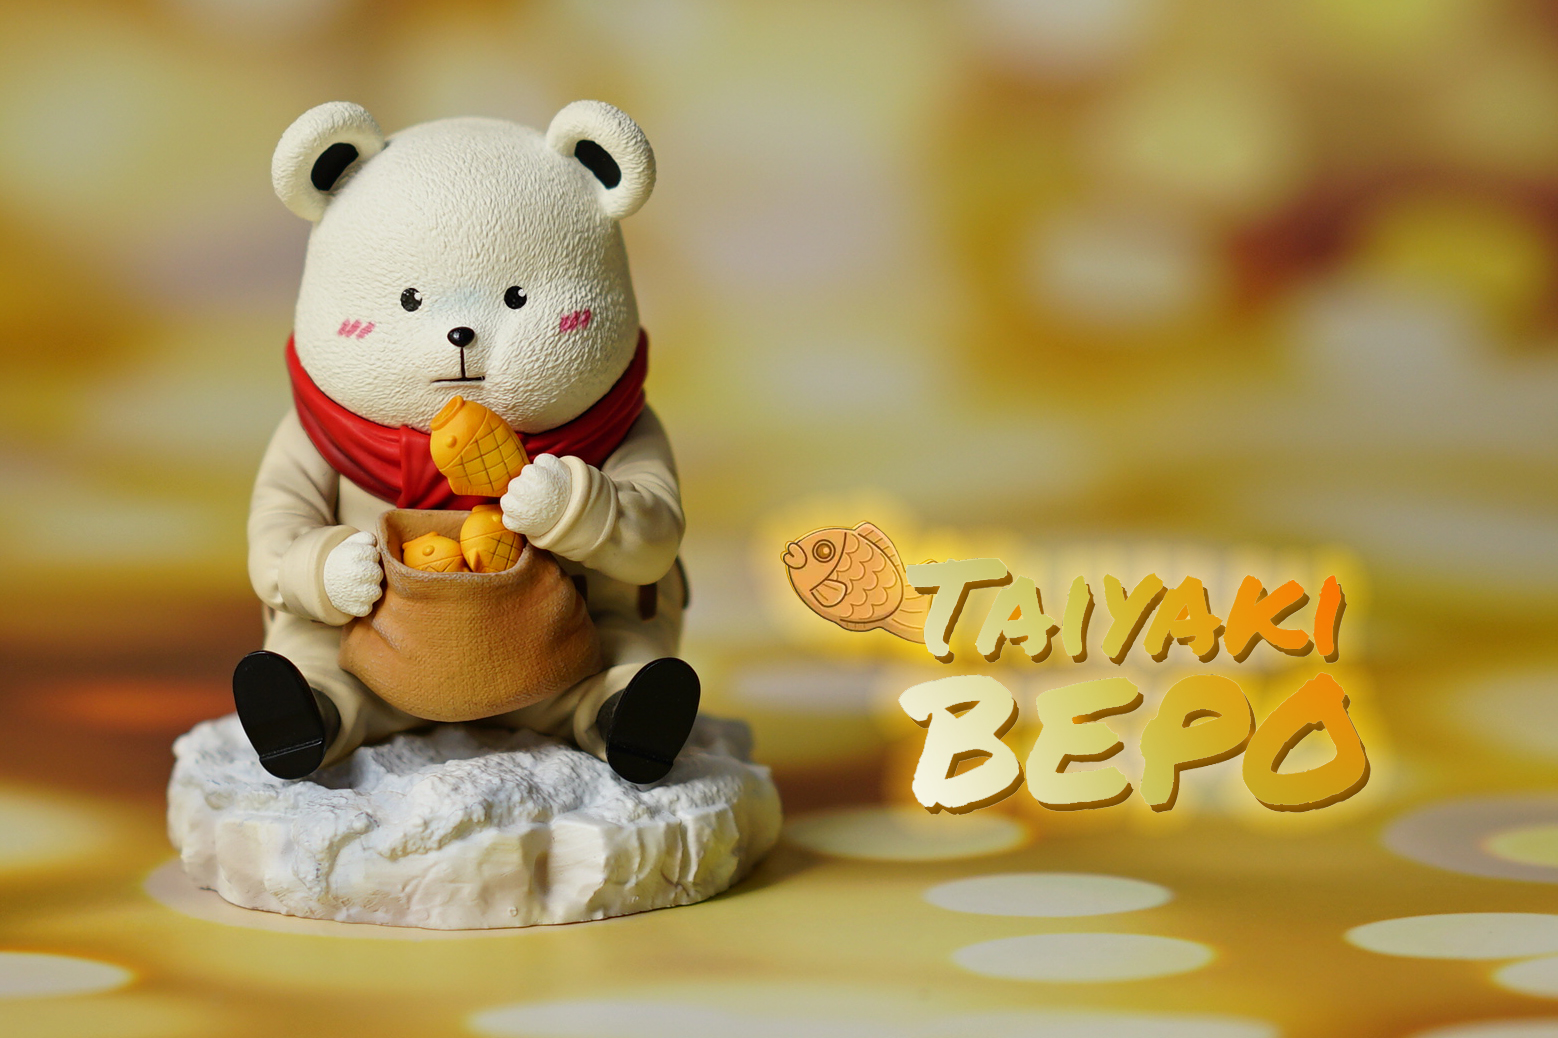 White BEPO น้องหมี x ขนมไทยากิ  A+ Studio (มัดจำ) [[SOLD OUT]]